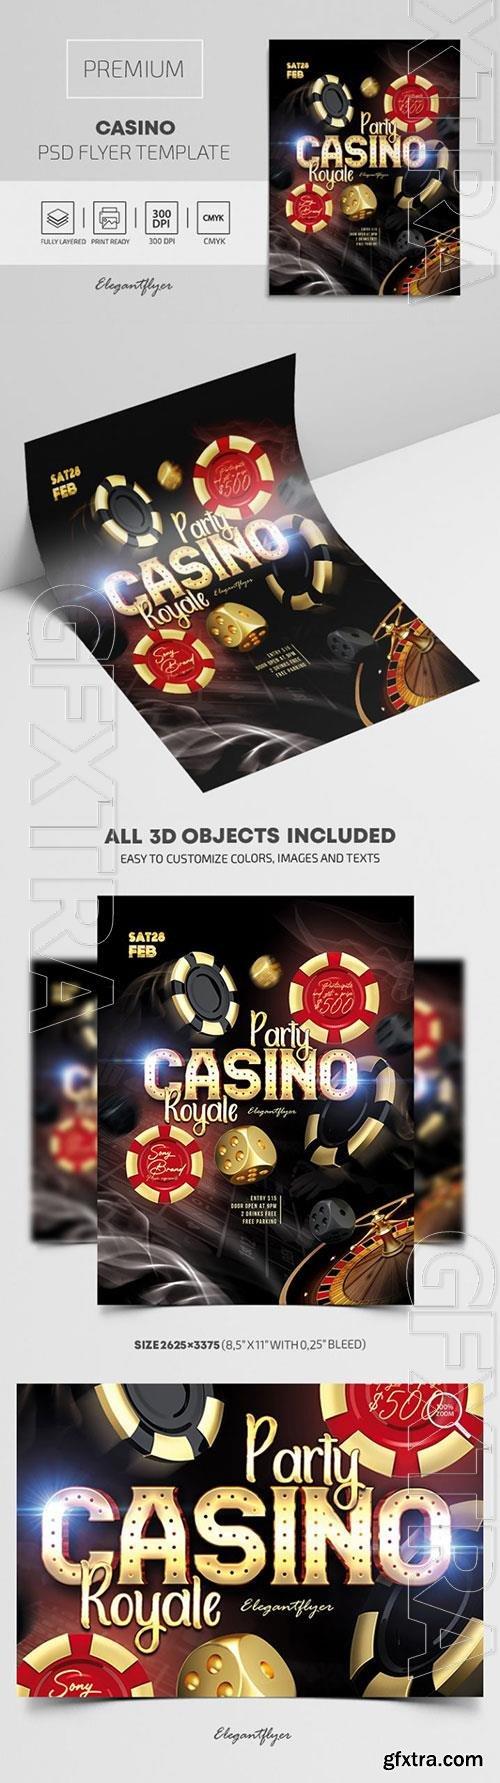 Casino Premium PSD Flyer Template